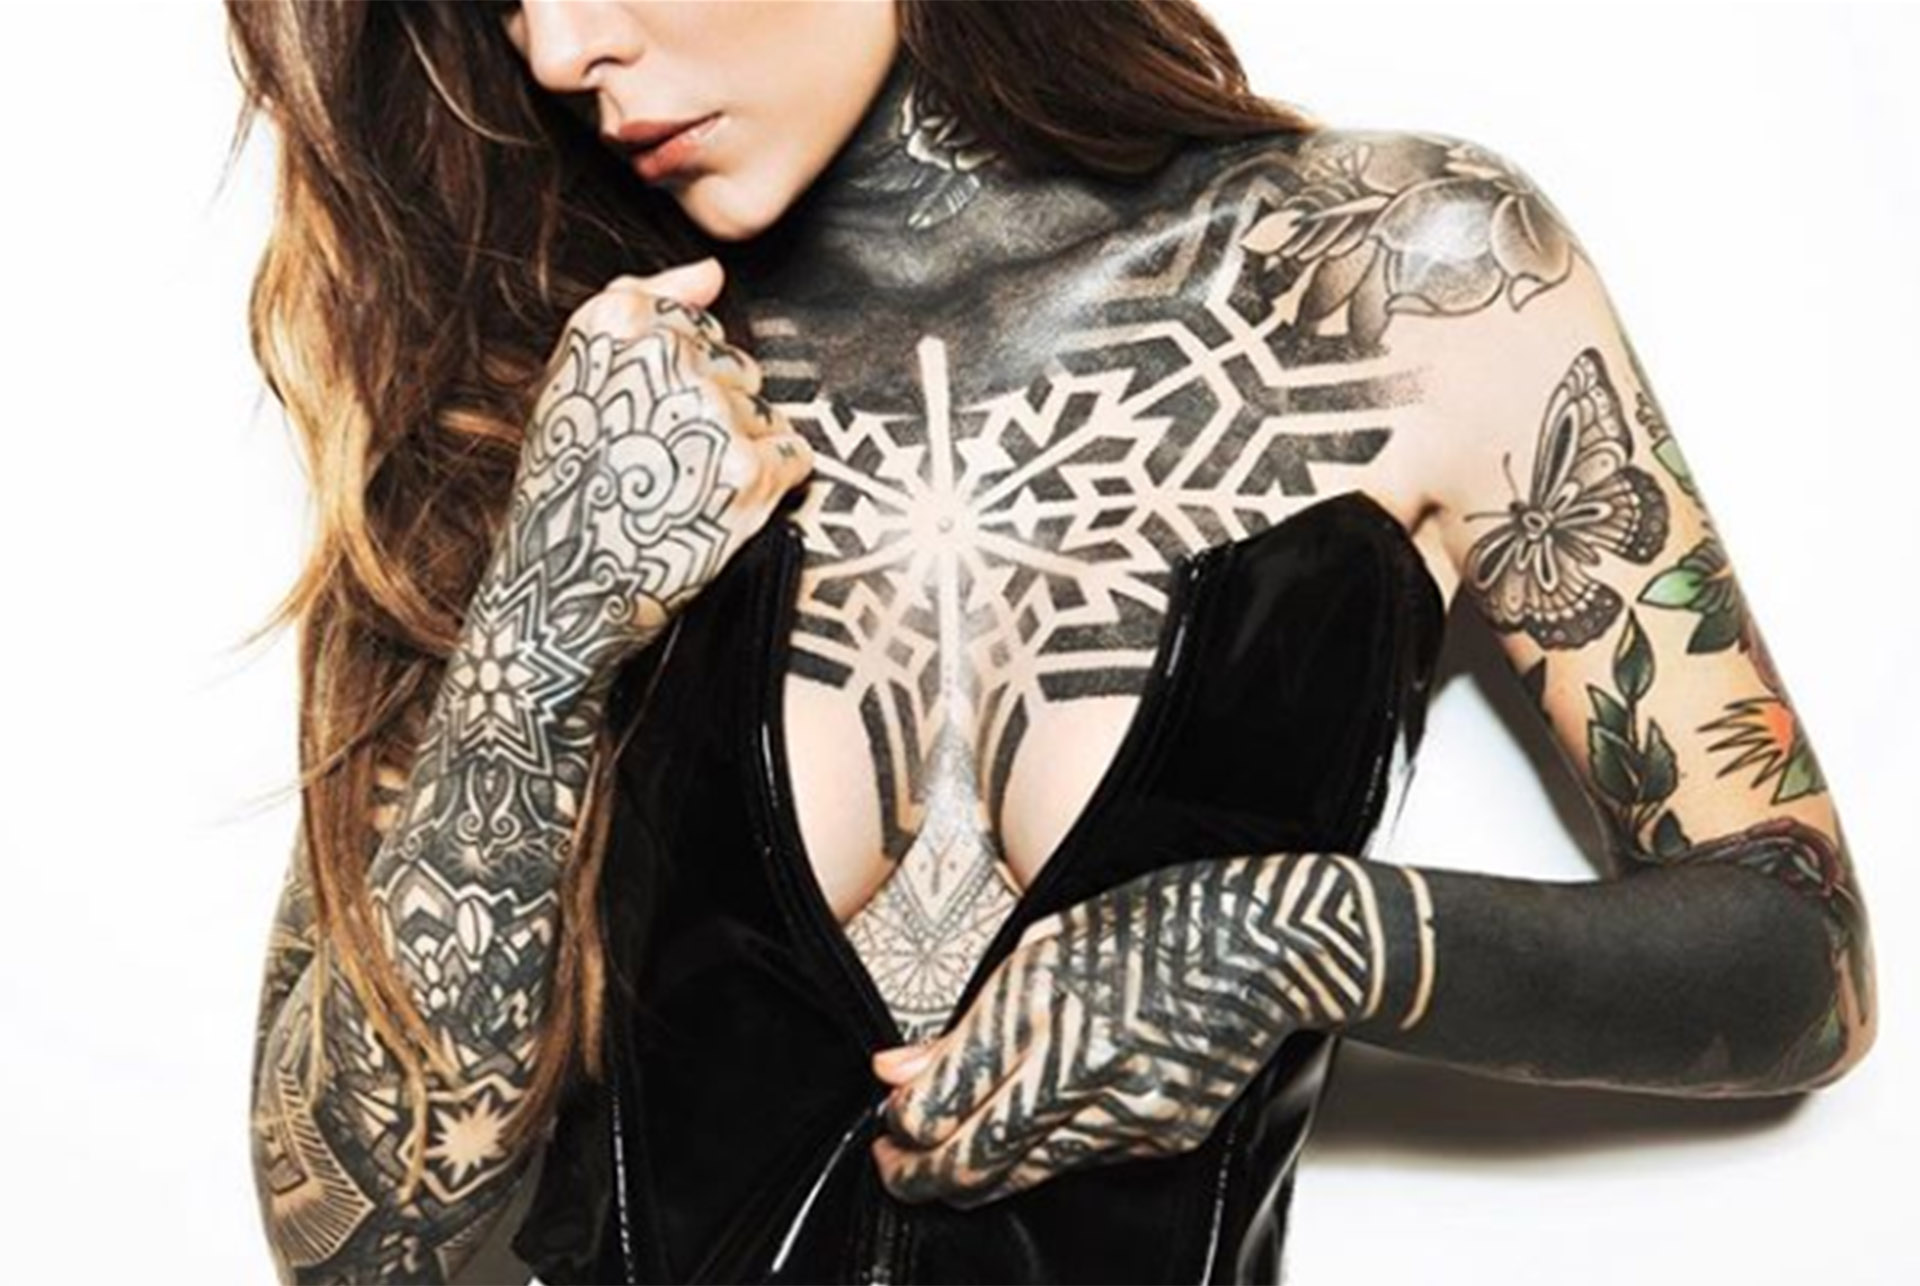 Candelaria Tinelli compartió una foto en Instagram mostrando sus diversos tatuajes(Foto: Instagram)